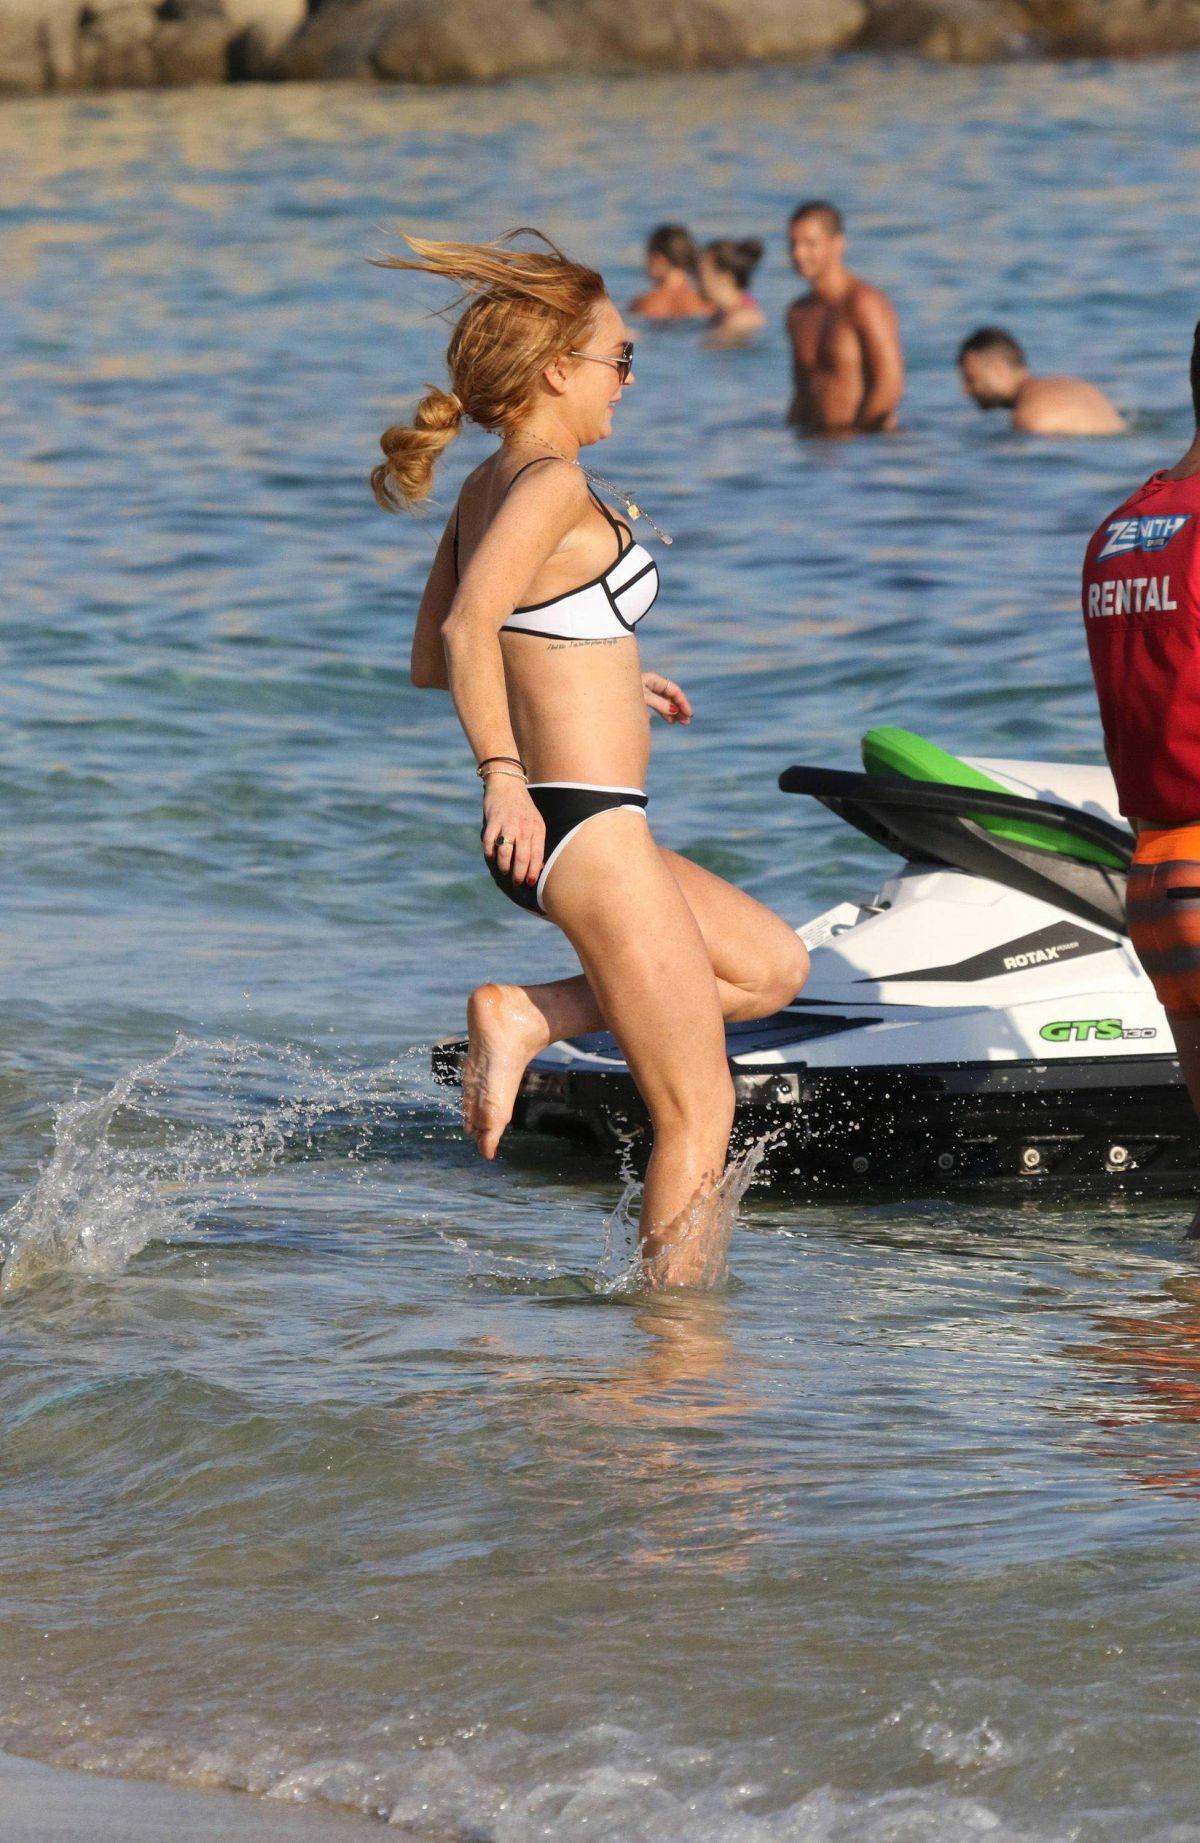 lohan party piven bikini Lindsay at